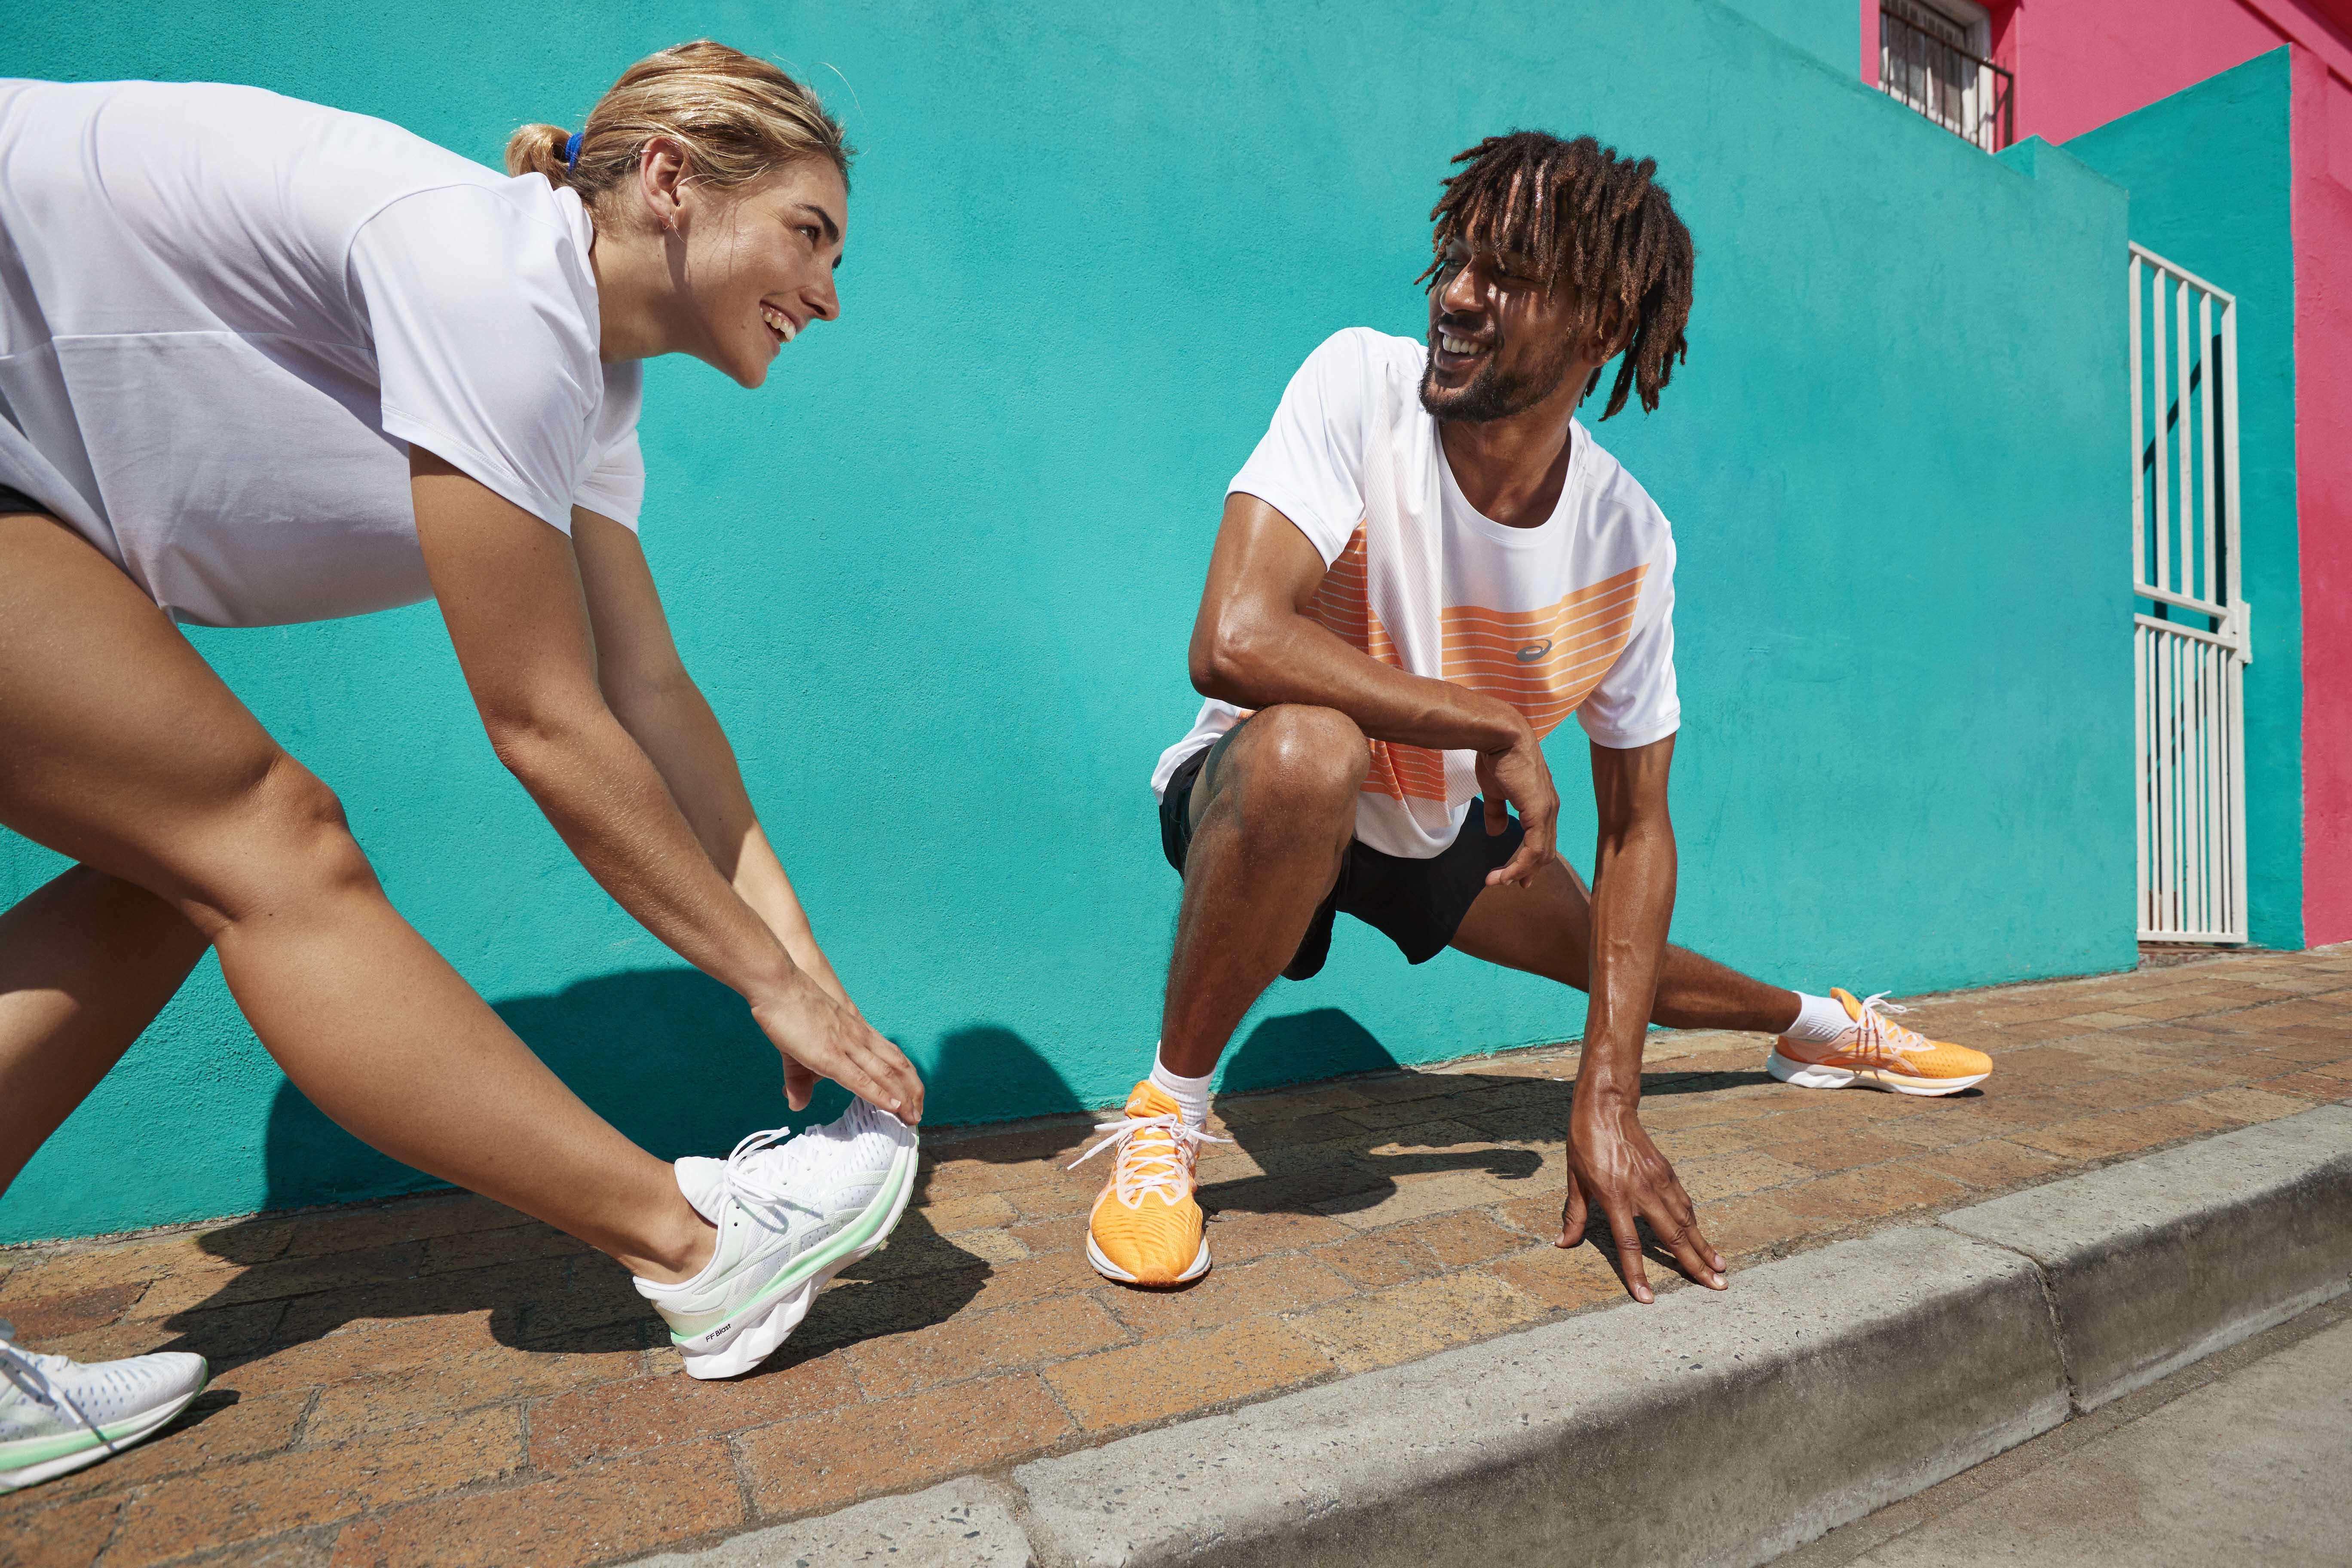 ASICS Frontrunner - La nouvelle chaussure ASICS NOVABLAST ™